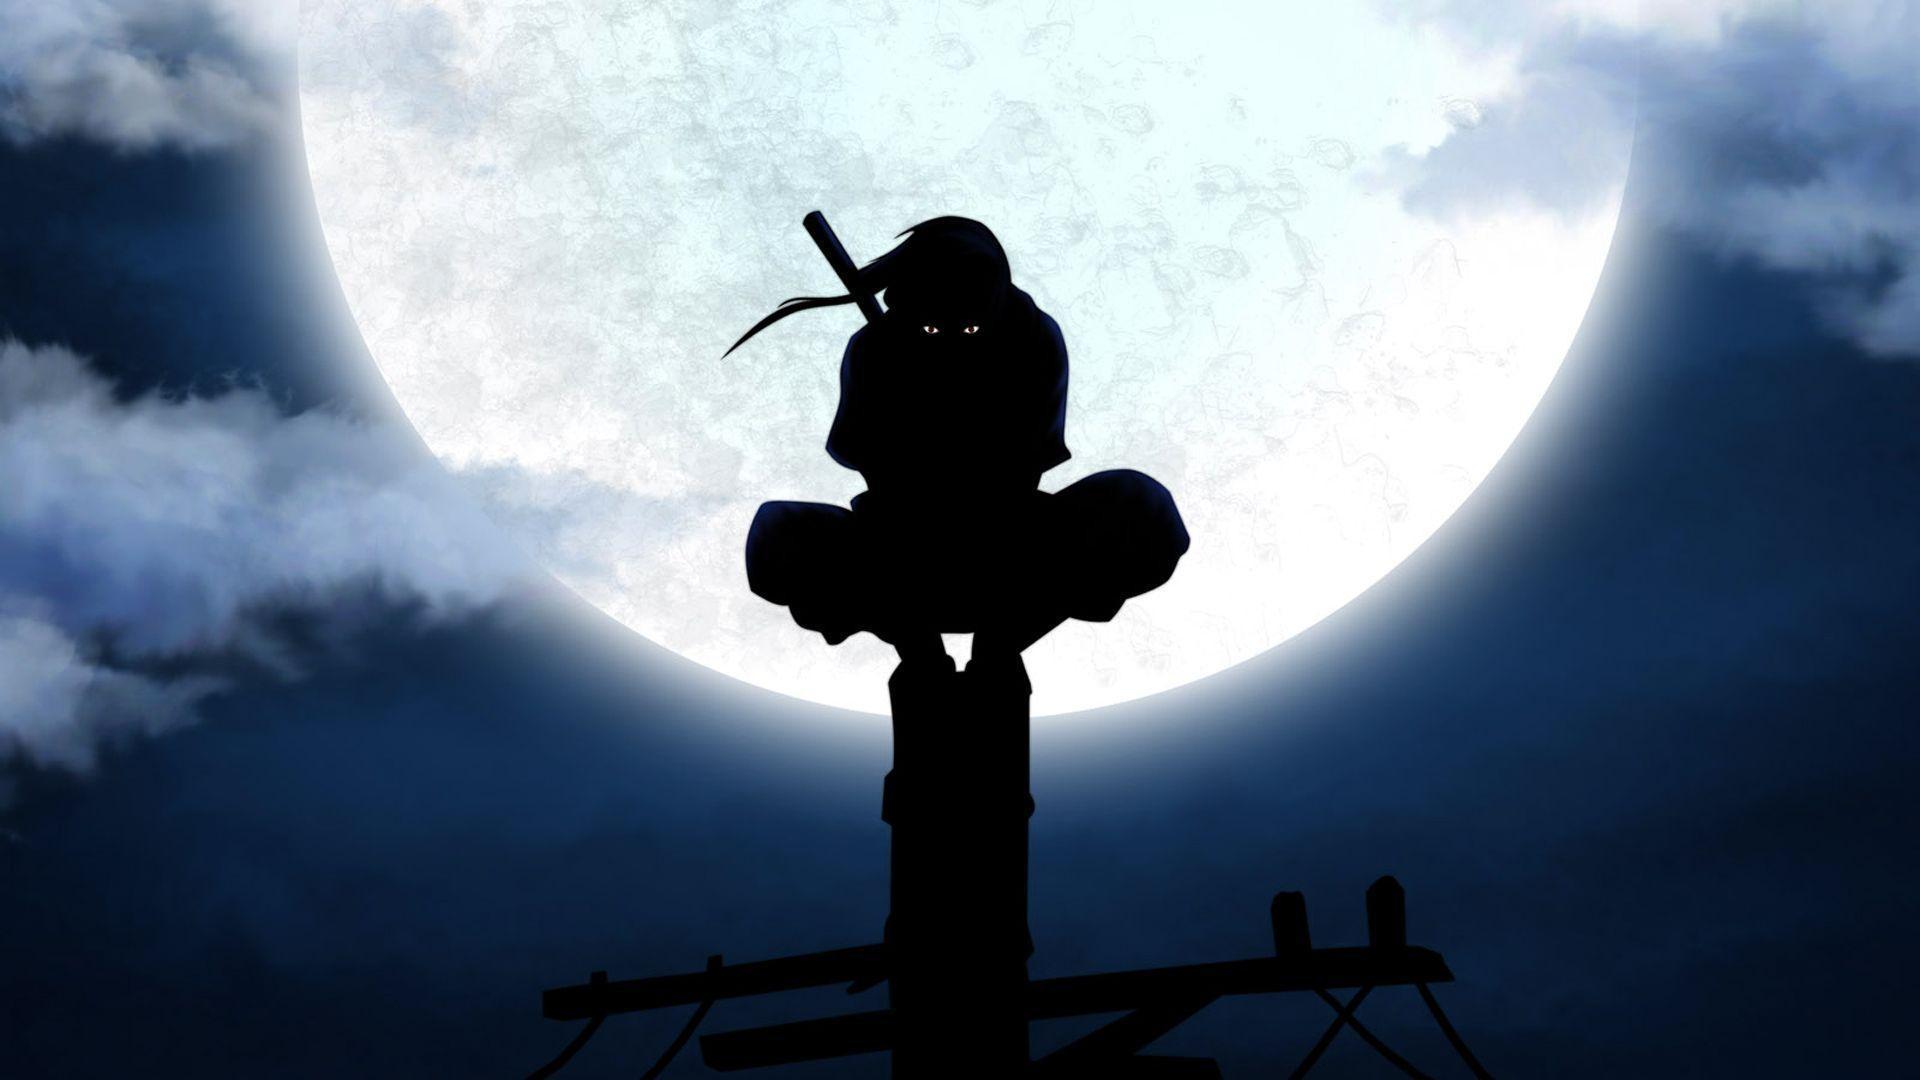 uchiha sasuke naruto shippuden uchiha itachi monochrome 1024×768 .